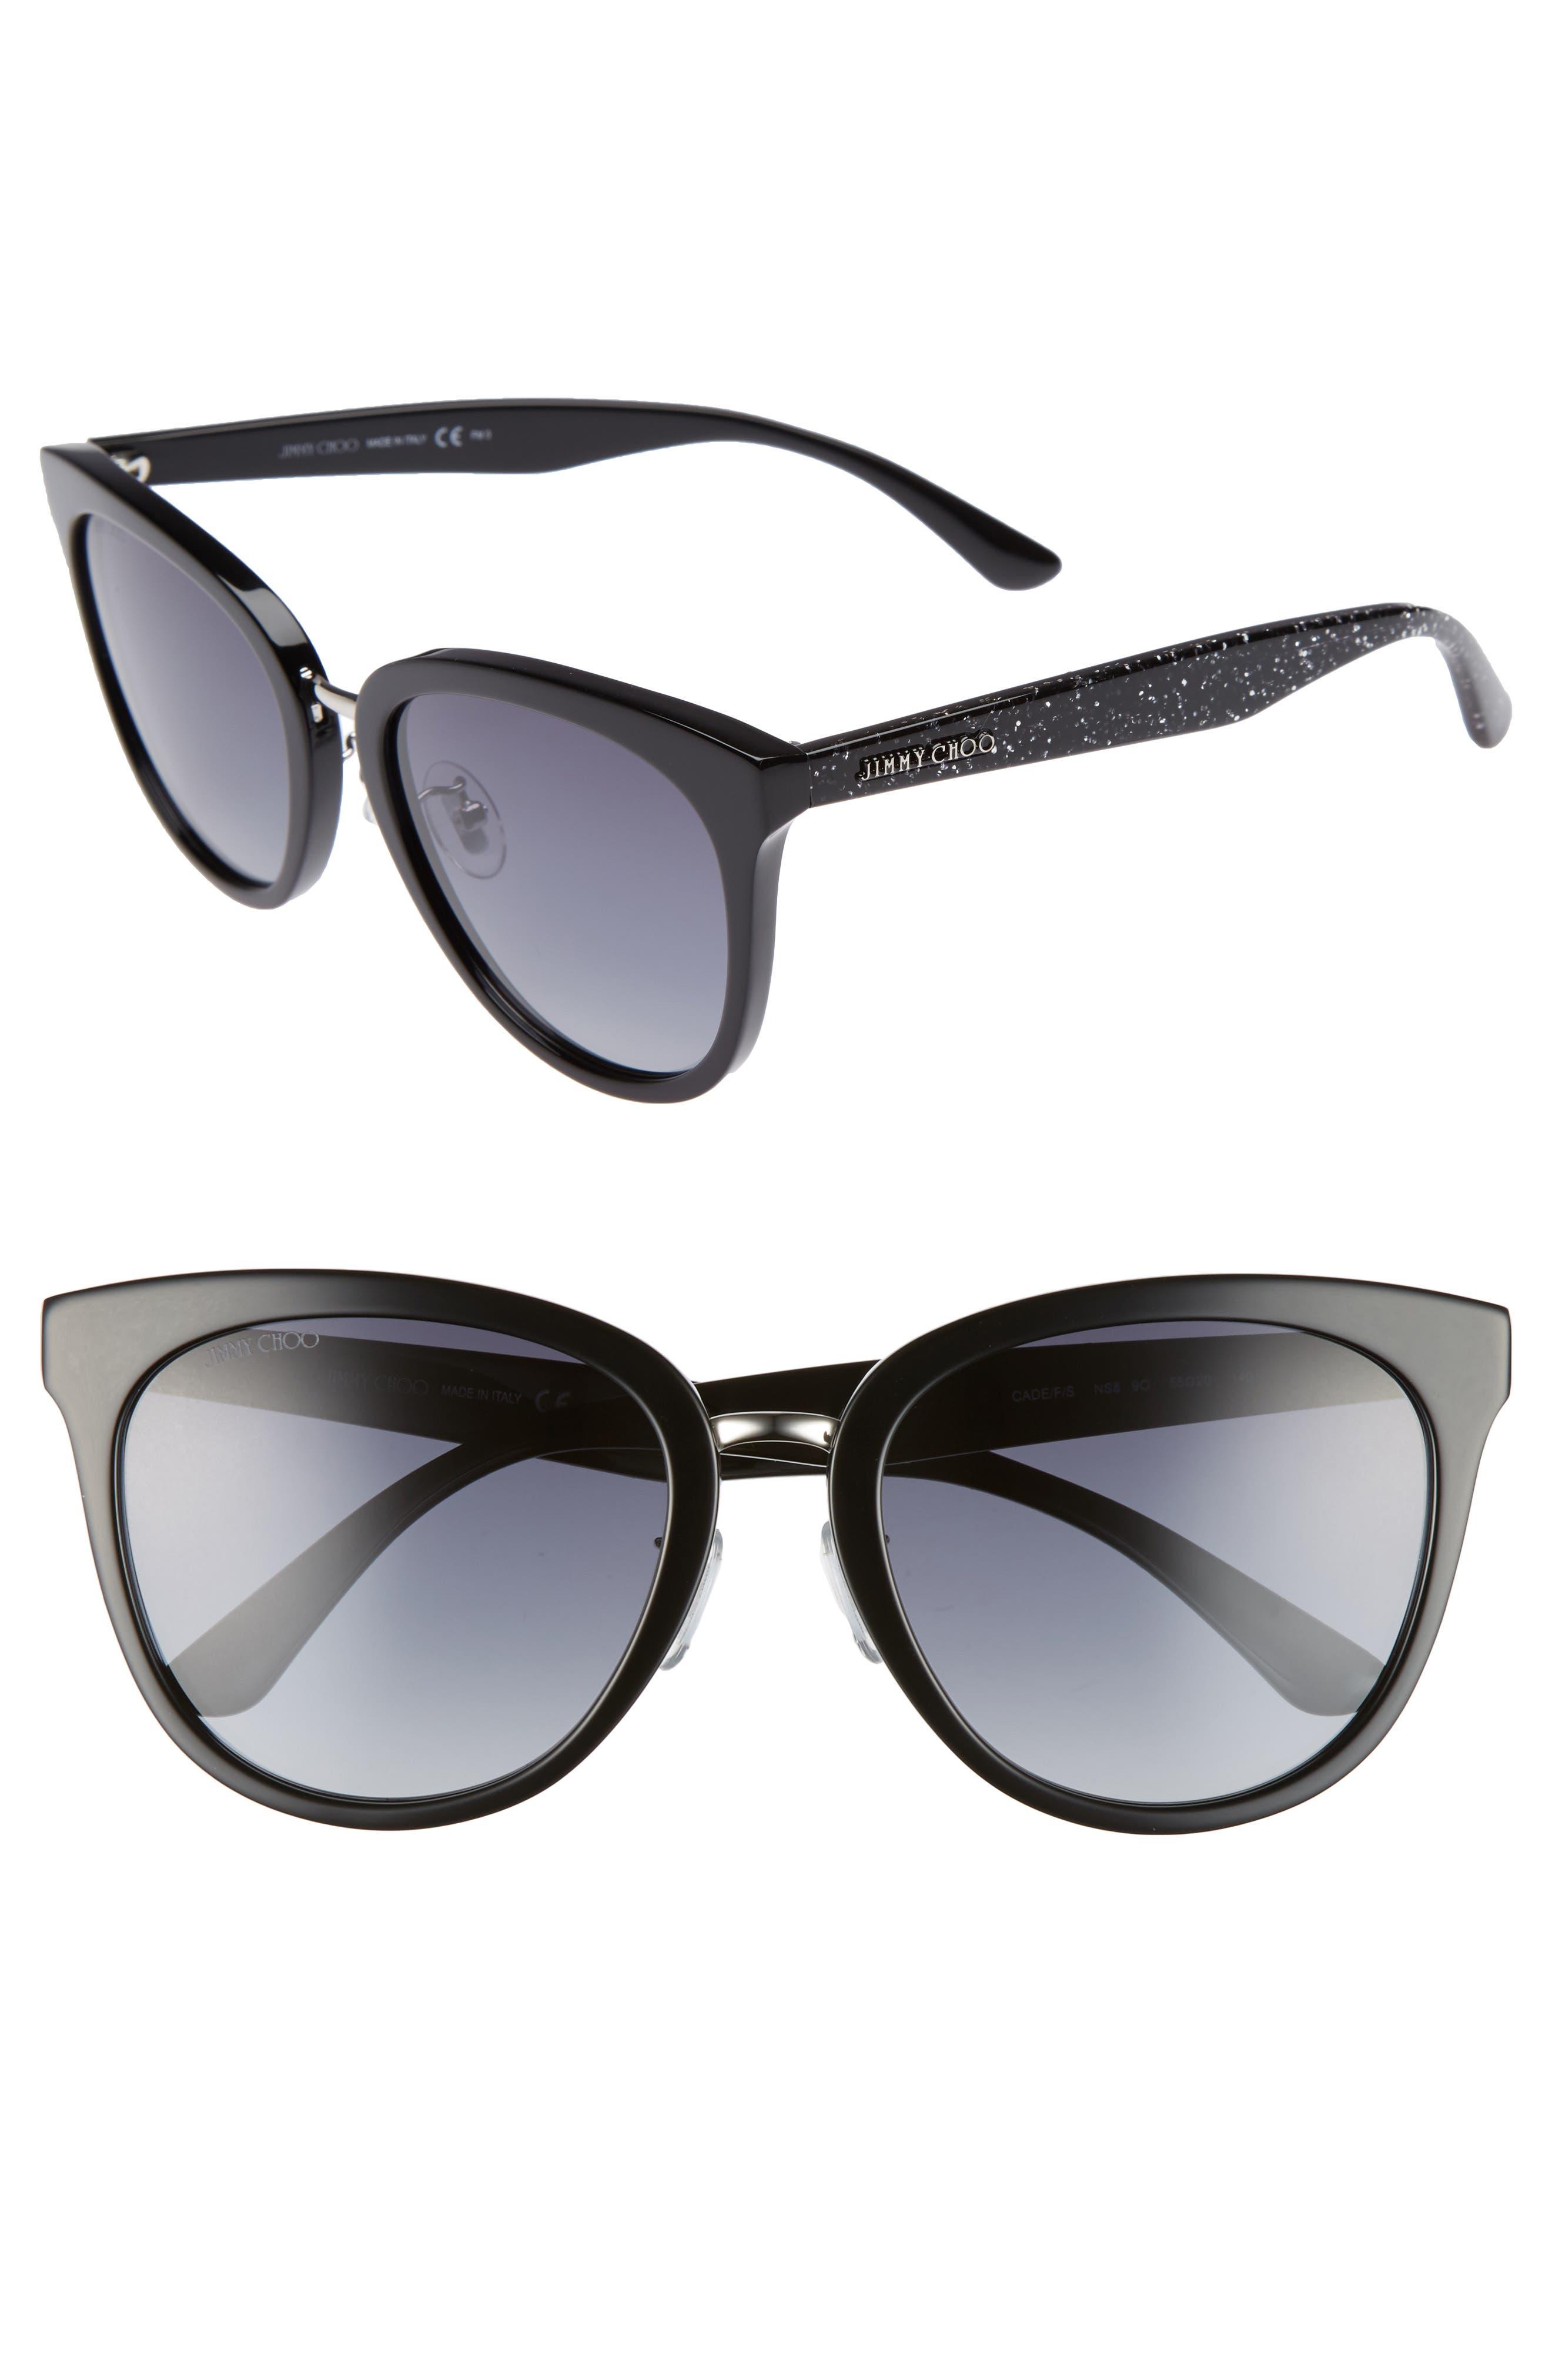 Cadefs 55mm Sunglasses,                         Main,                         color, 001